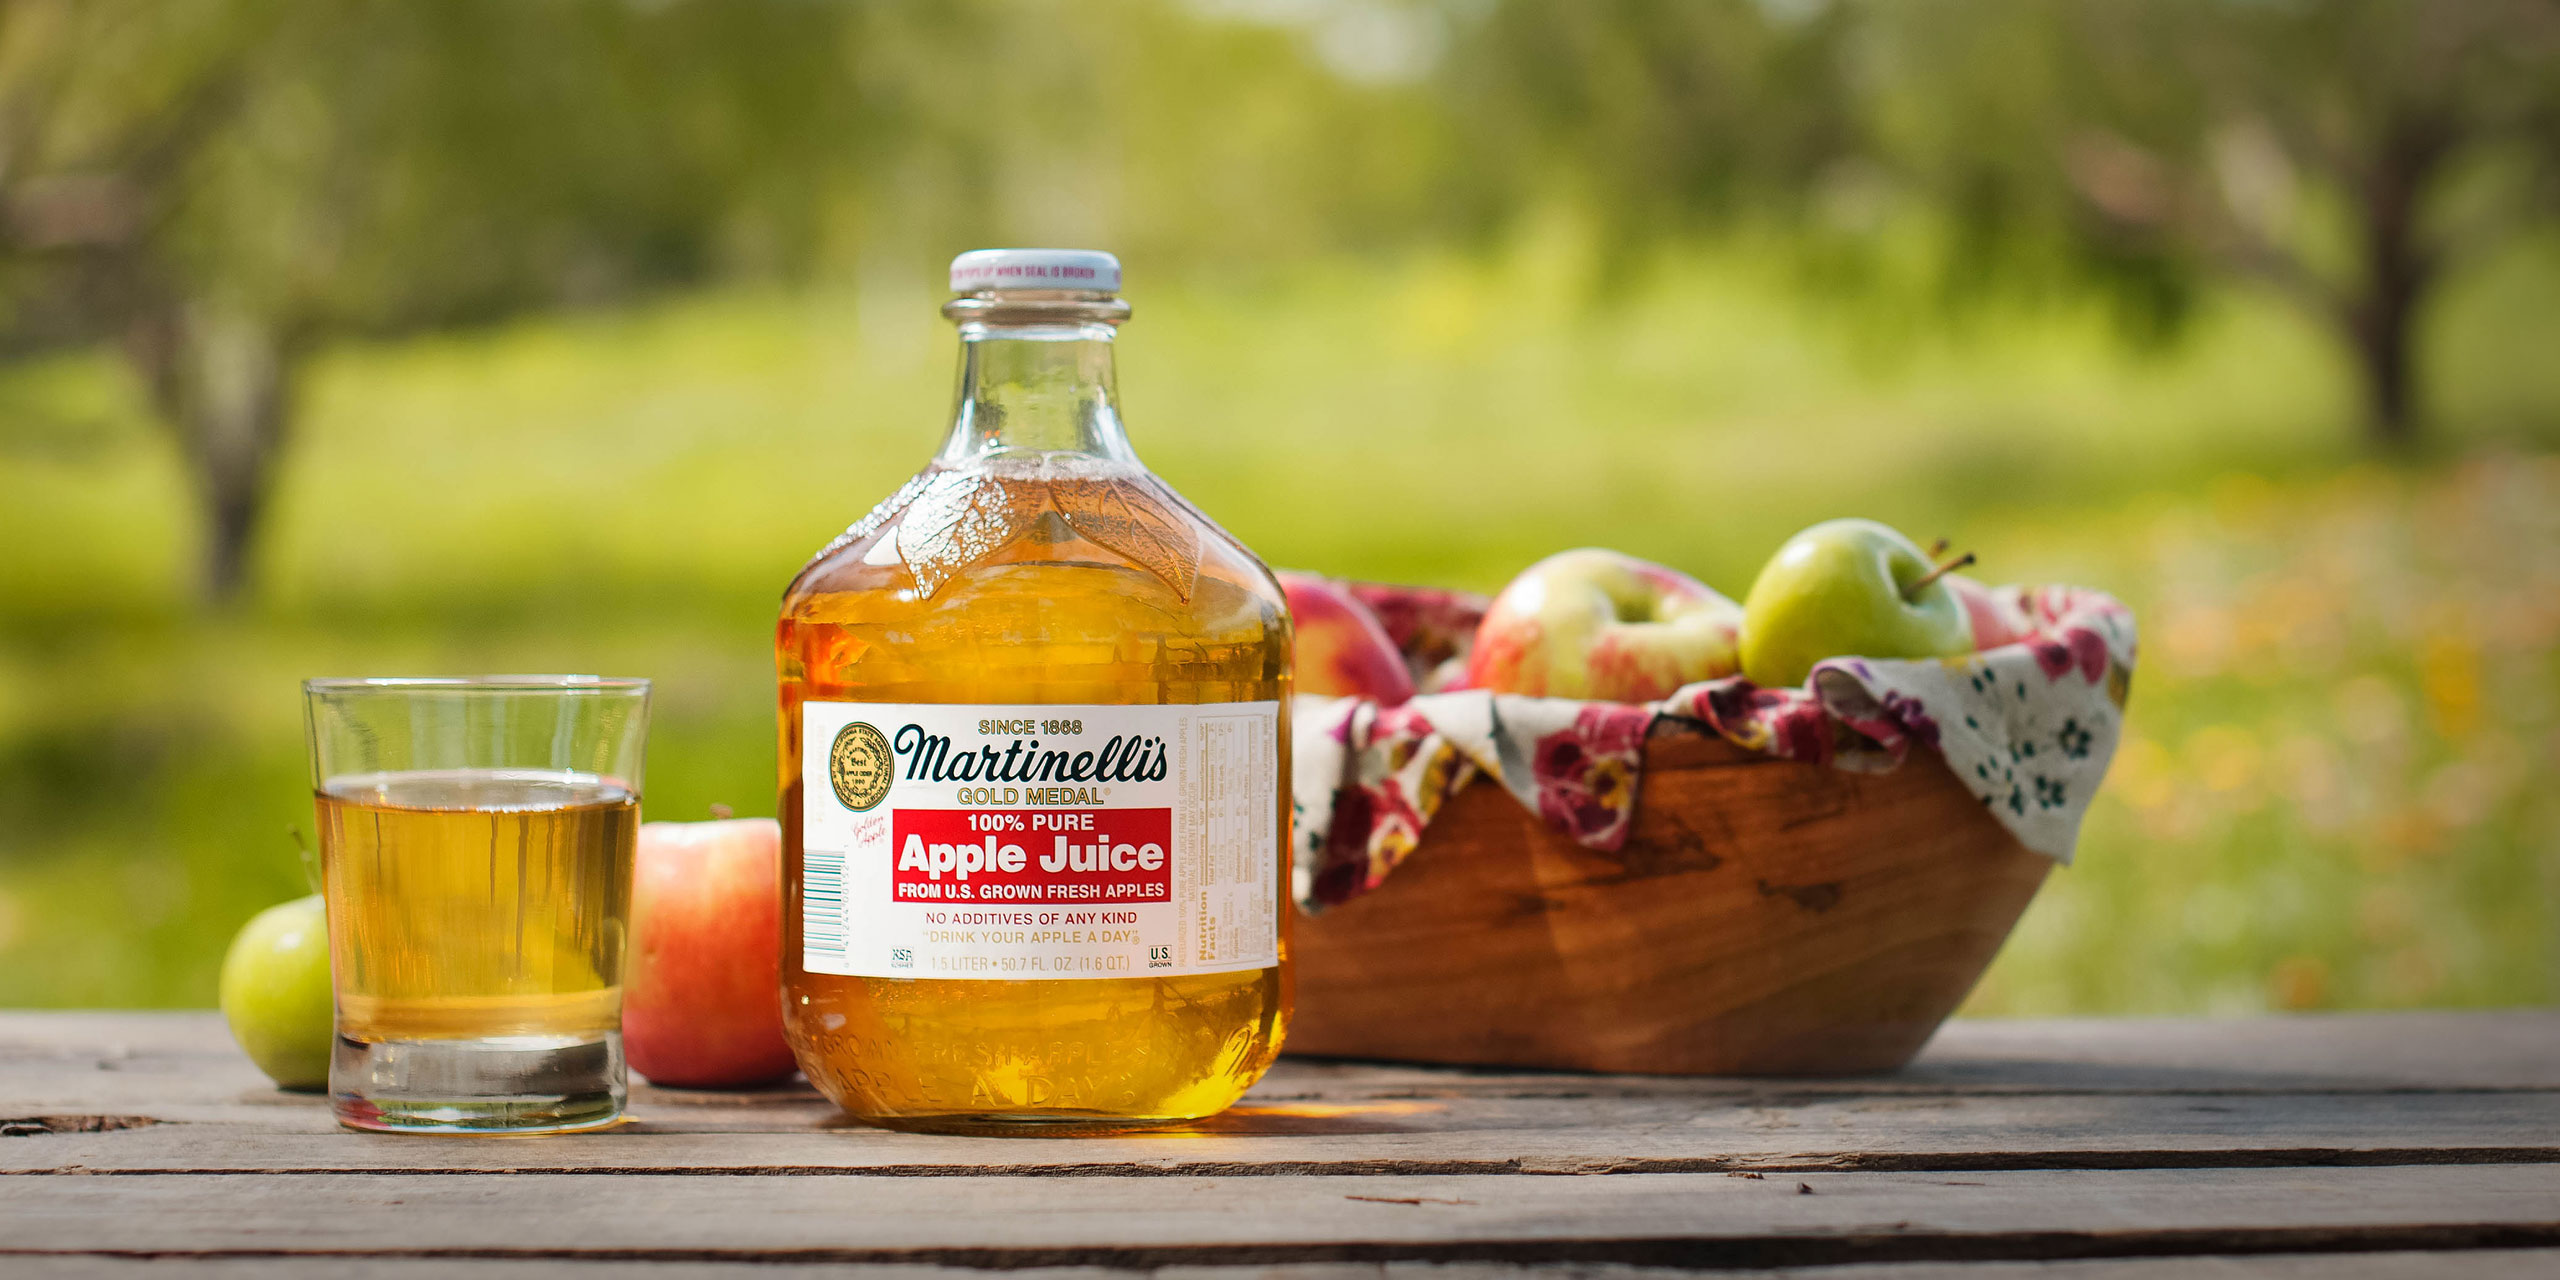 100% Apple Juice 50.7oz - Still Juices